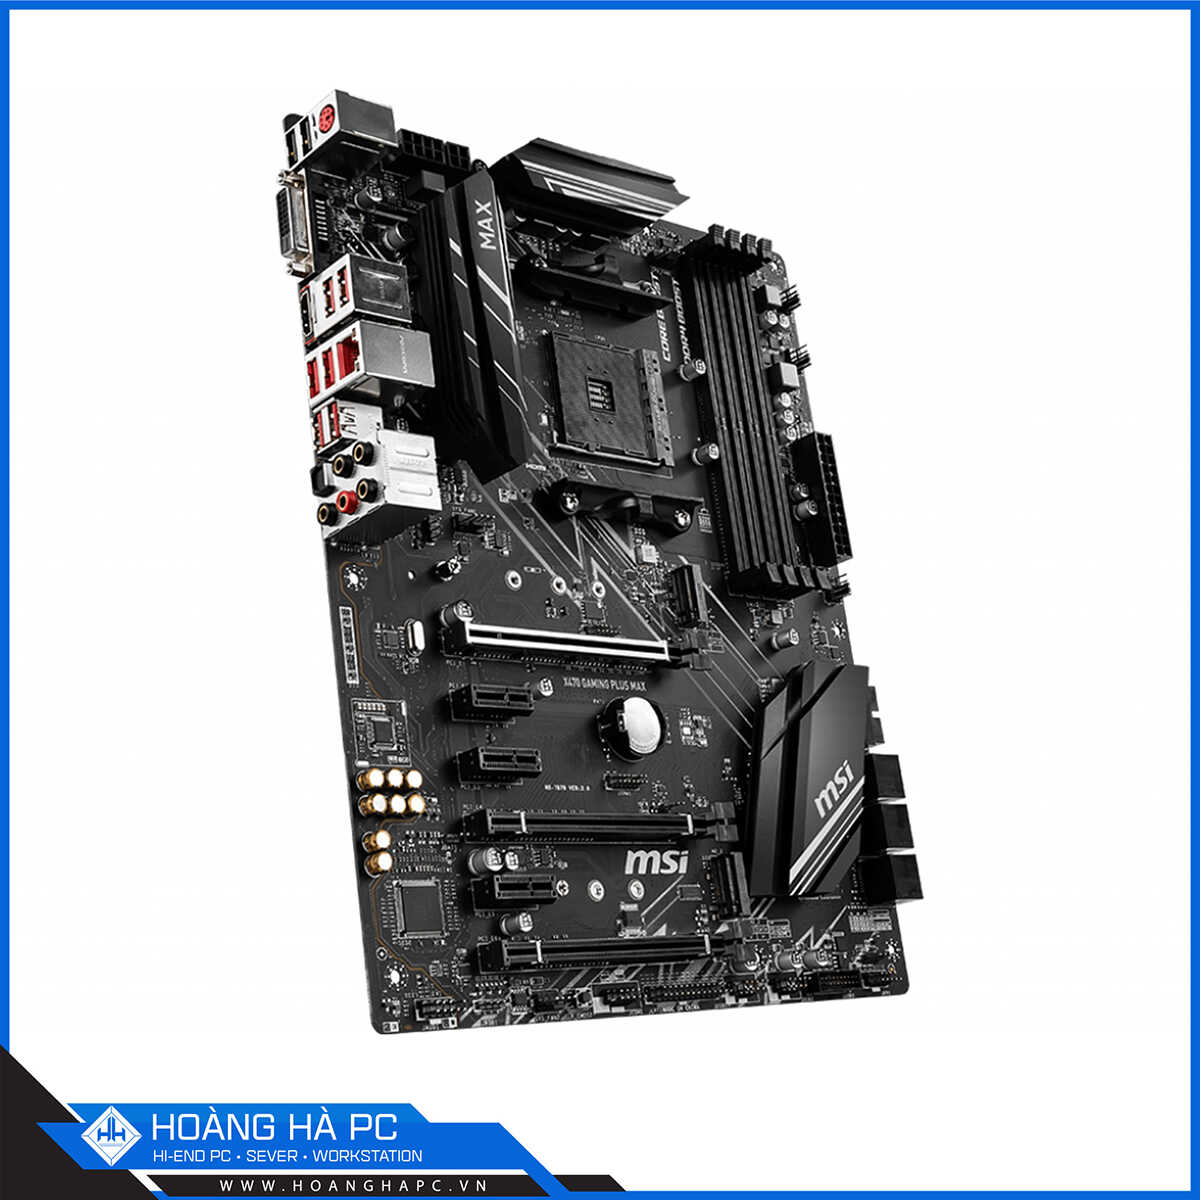 MAINBOARD MSI X470 GAMING PLUS MAX